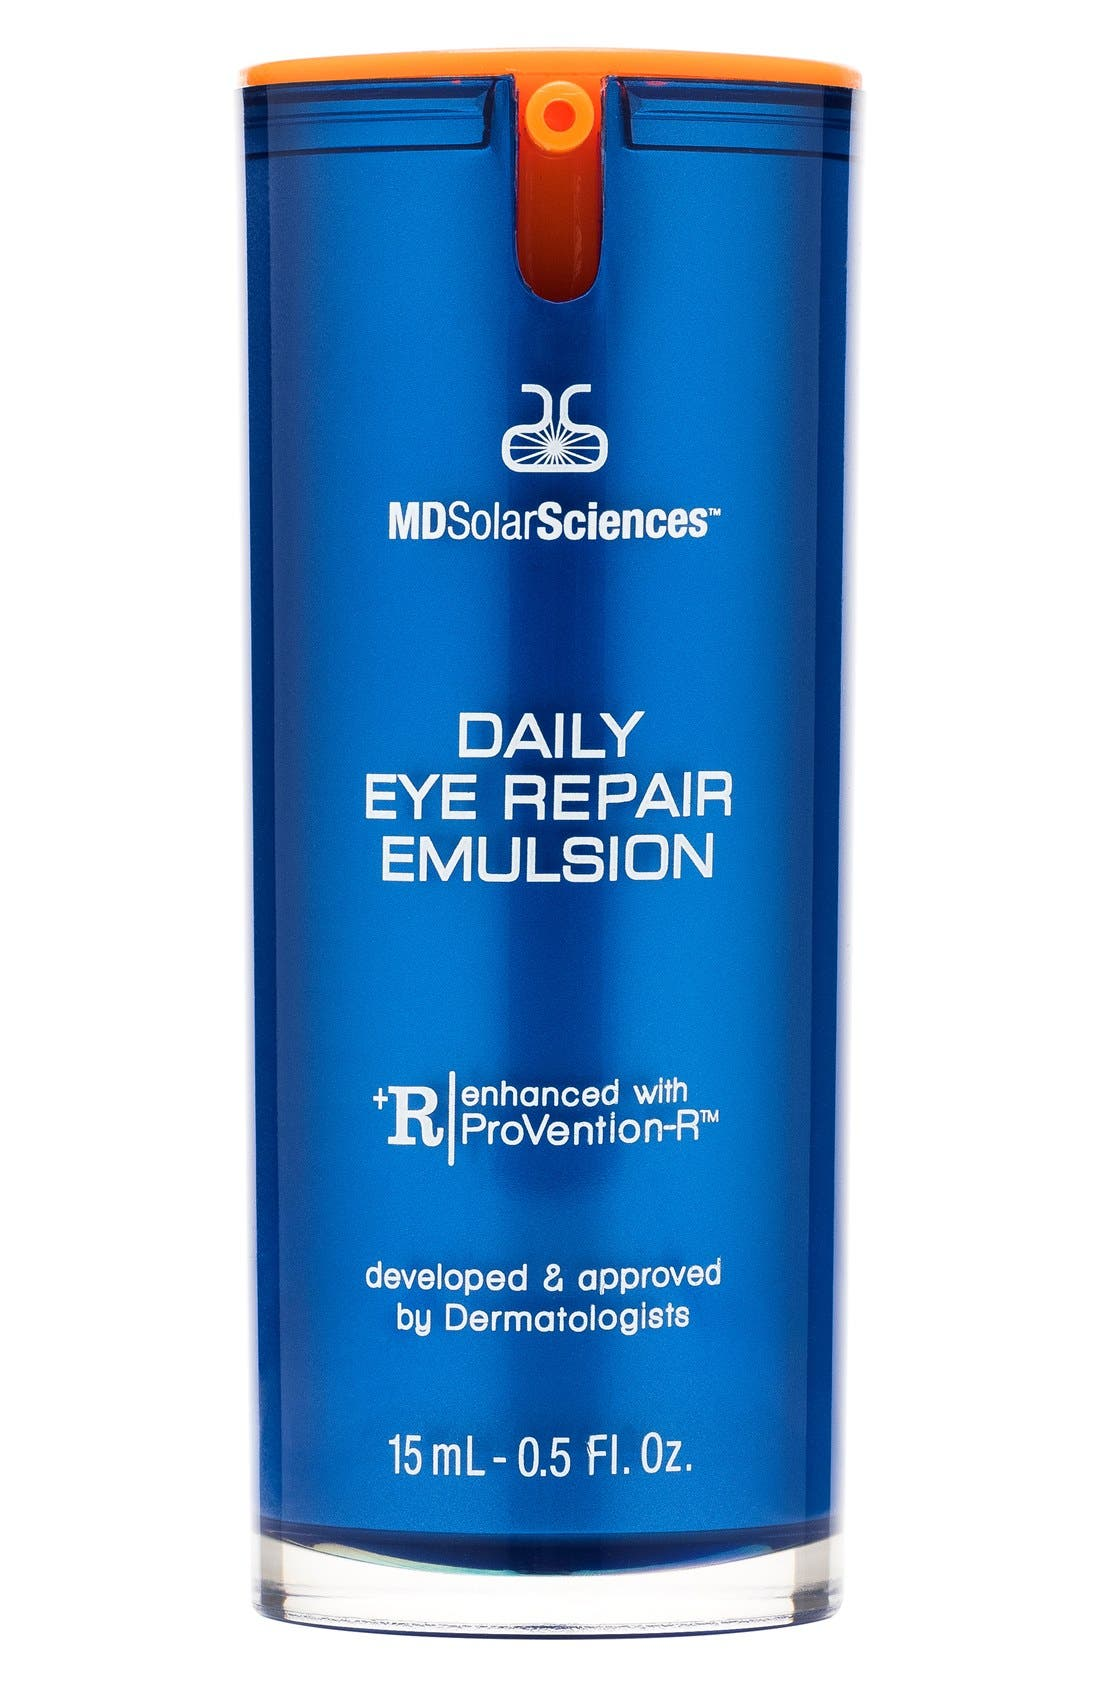 MDSolarSciences™ Daily Eye Repair Emulsion